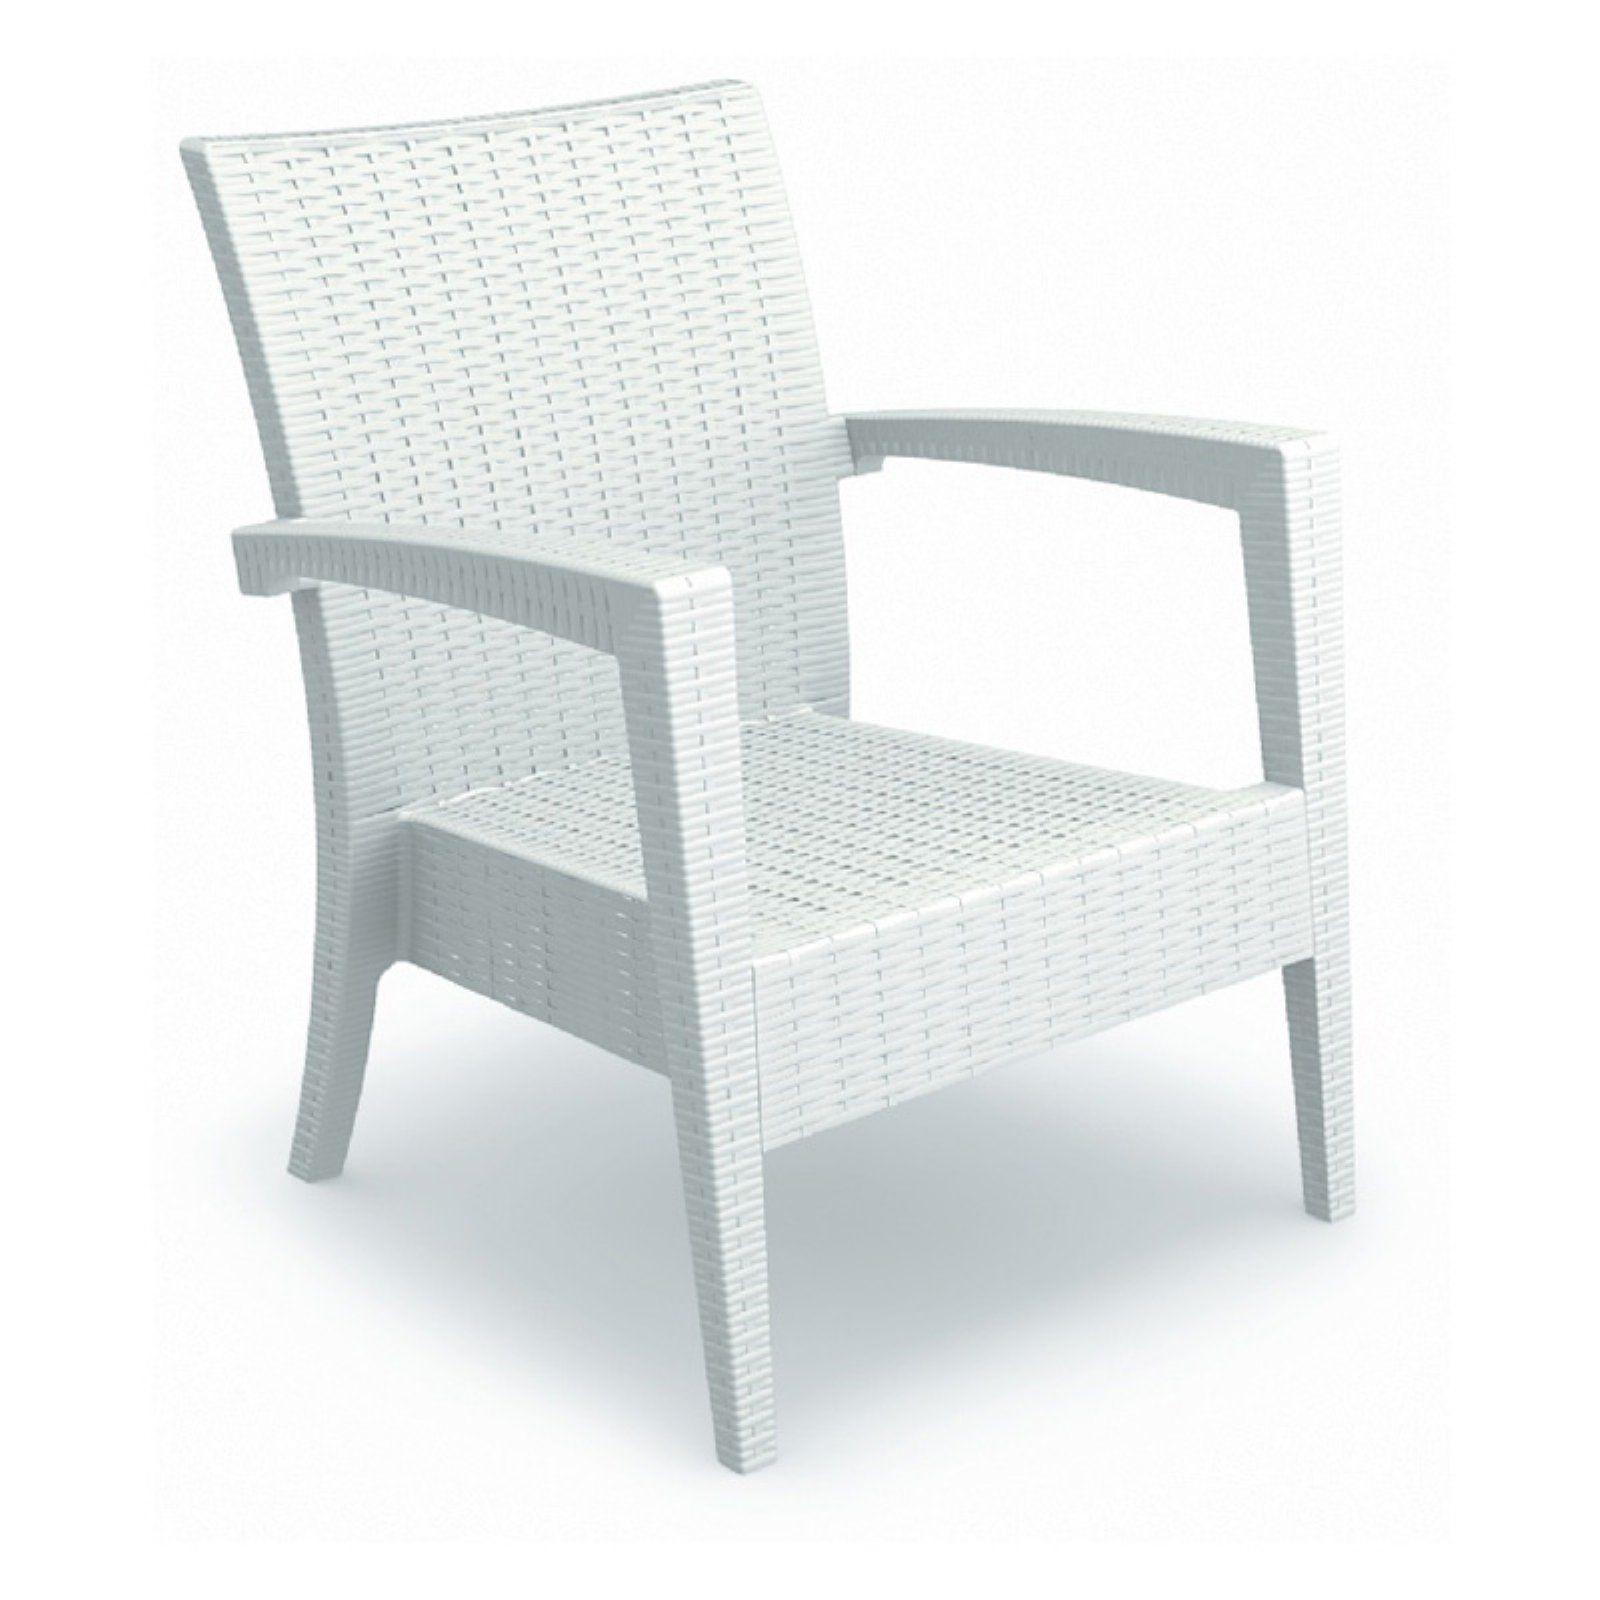 Outdoor Siesta ISP850 Miami Resin Club Chair - Set of 2 #resinpatiofurniture